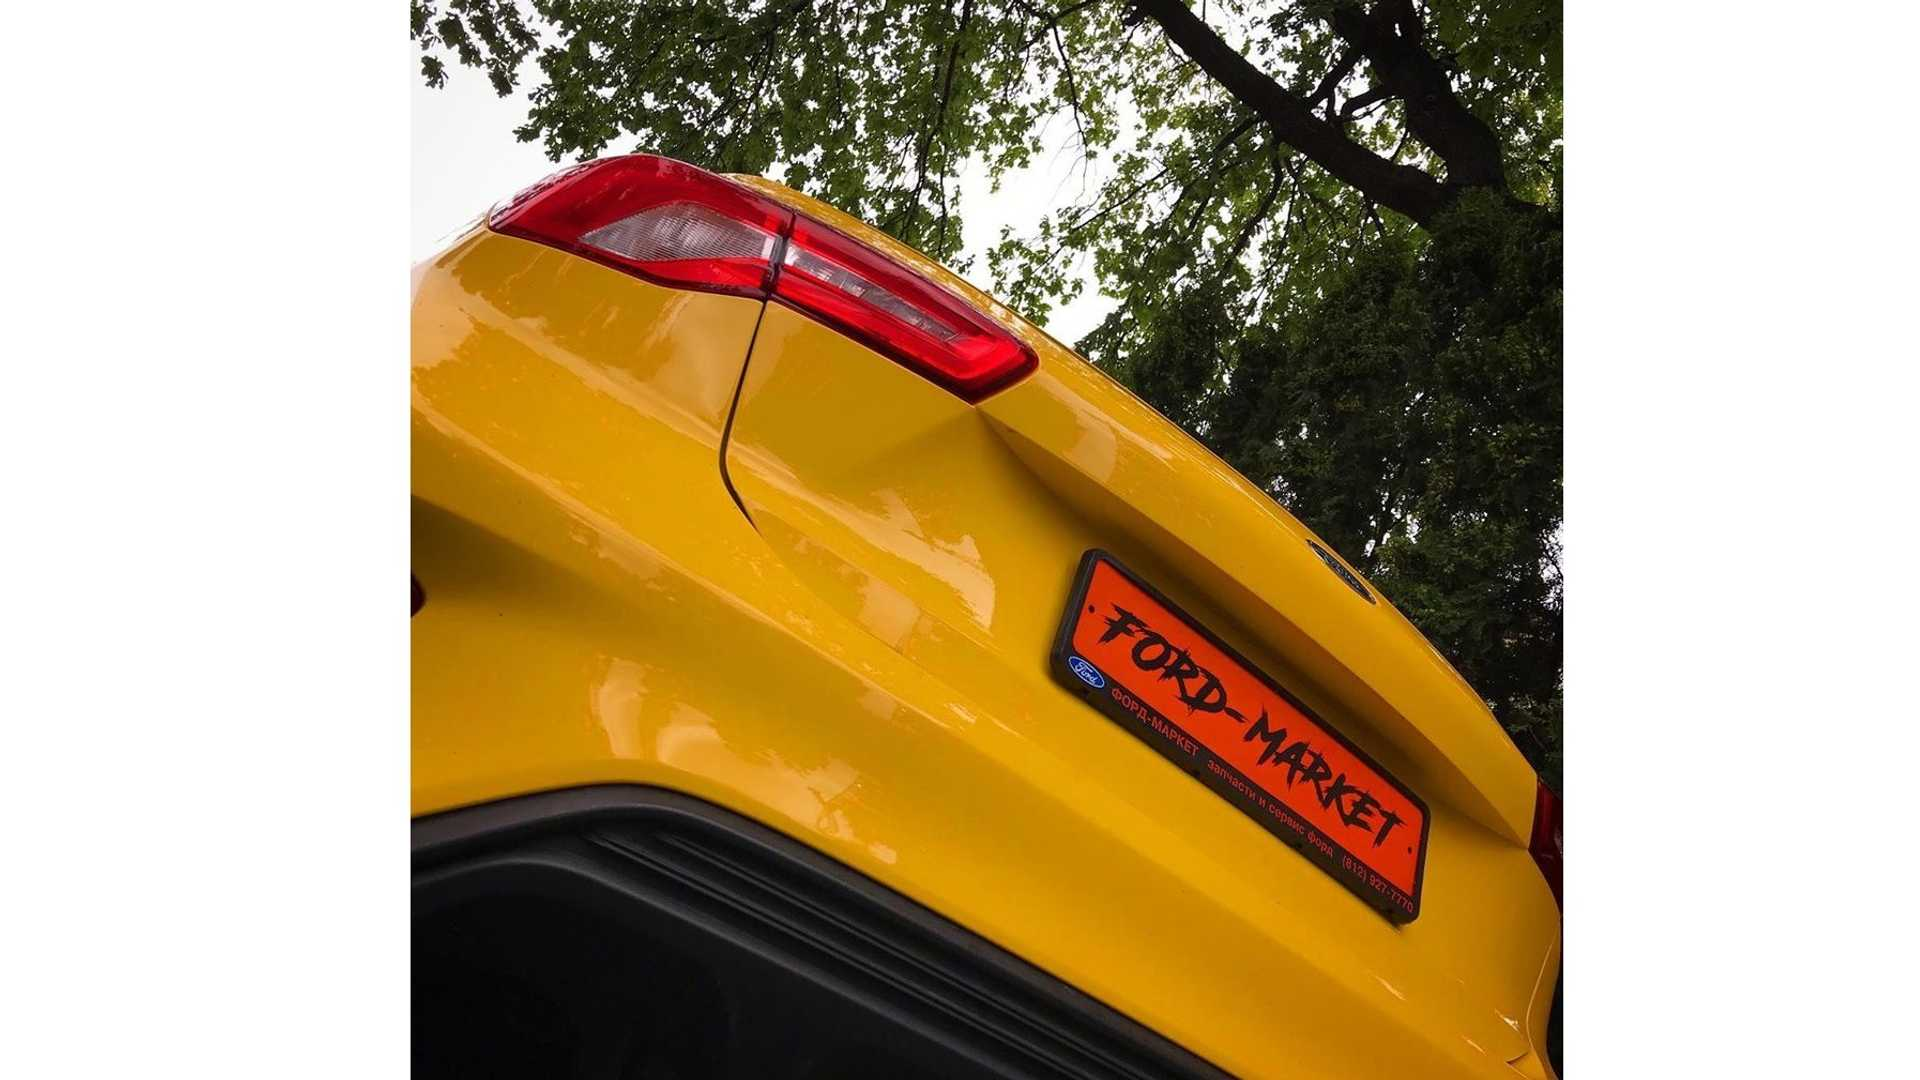 Ford_Focus_speedster_conversion_0011